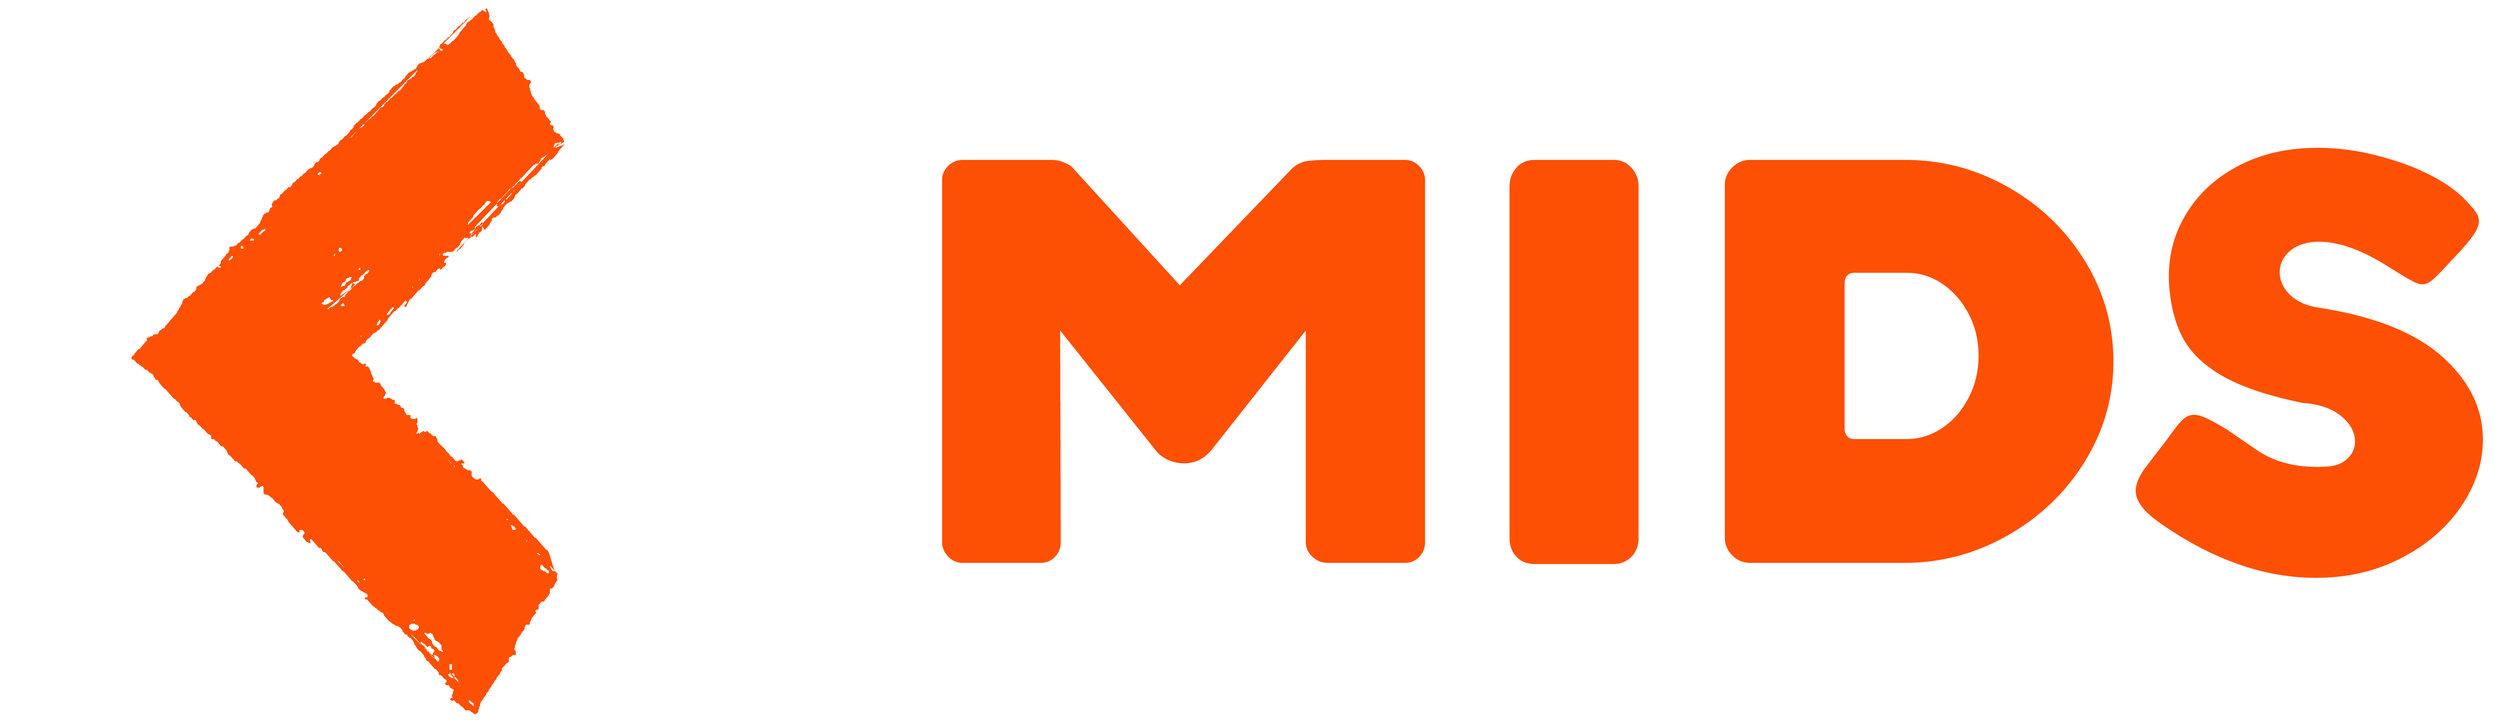 Mids_Logo_Hi_Color.jpg